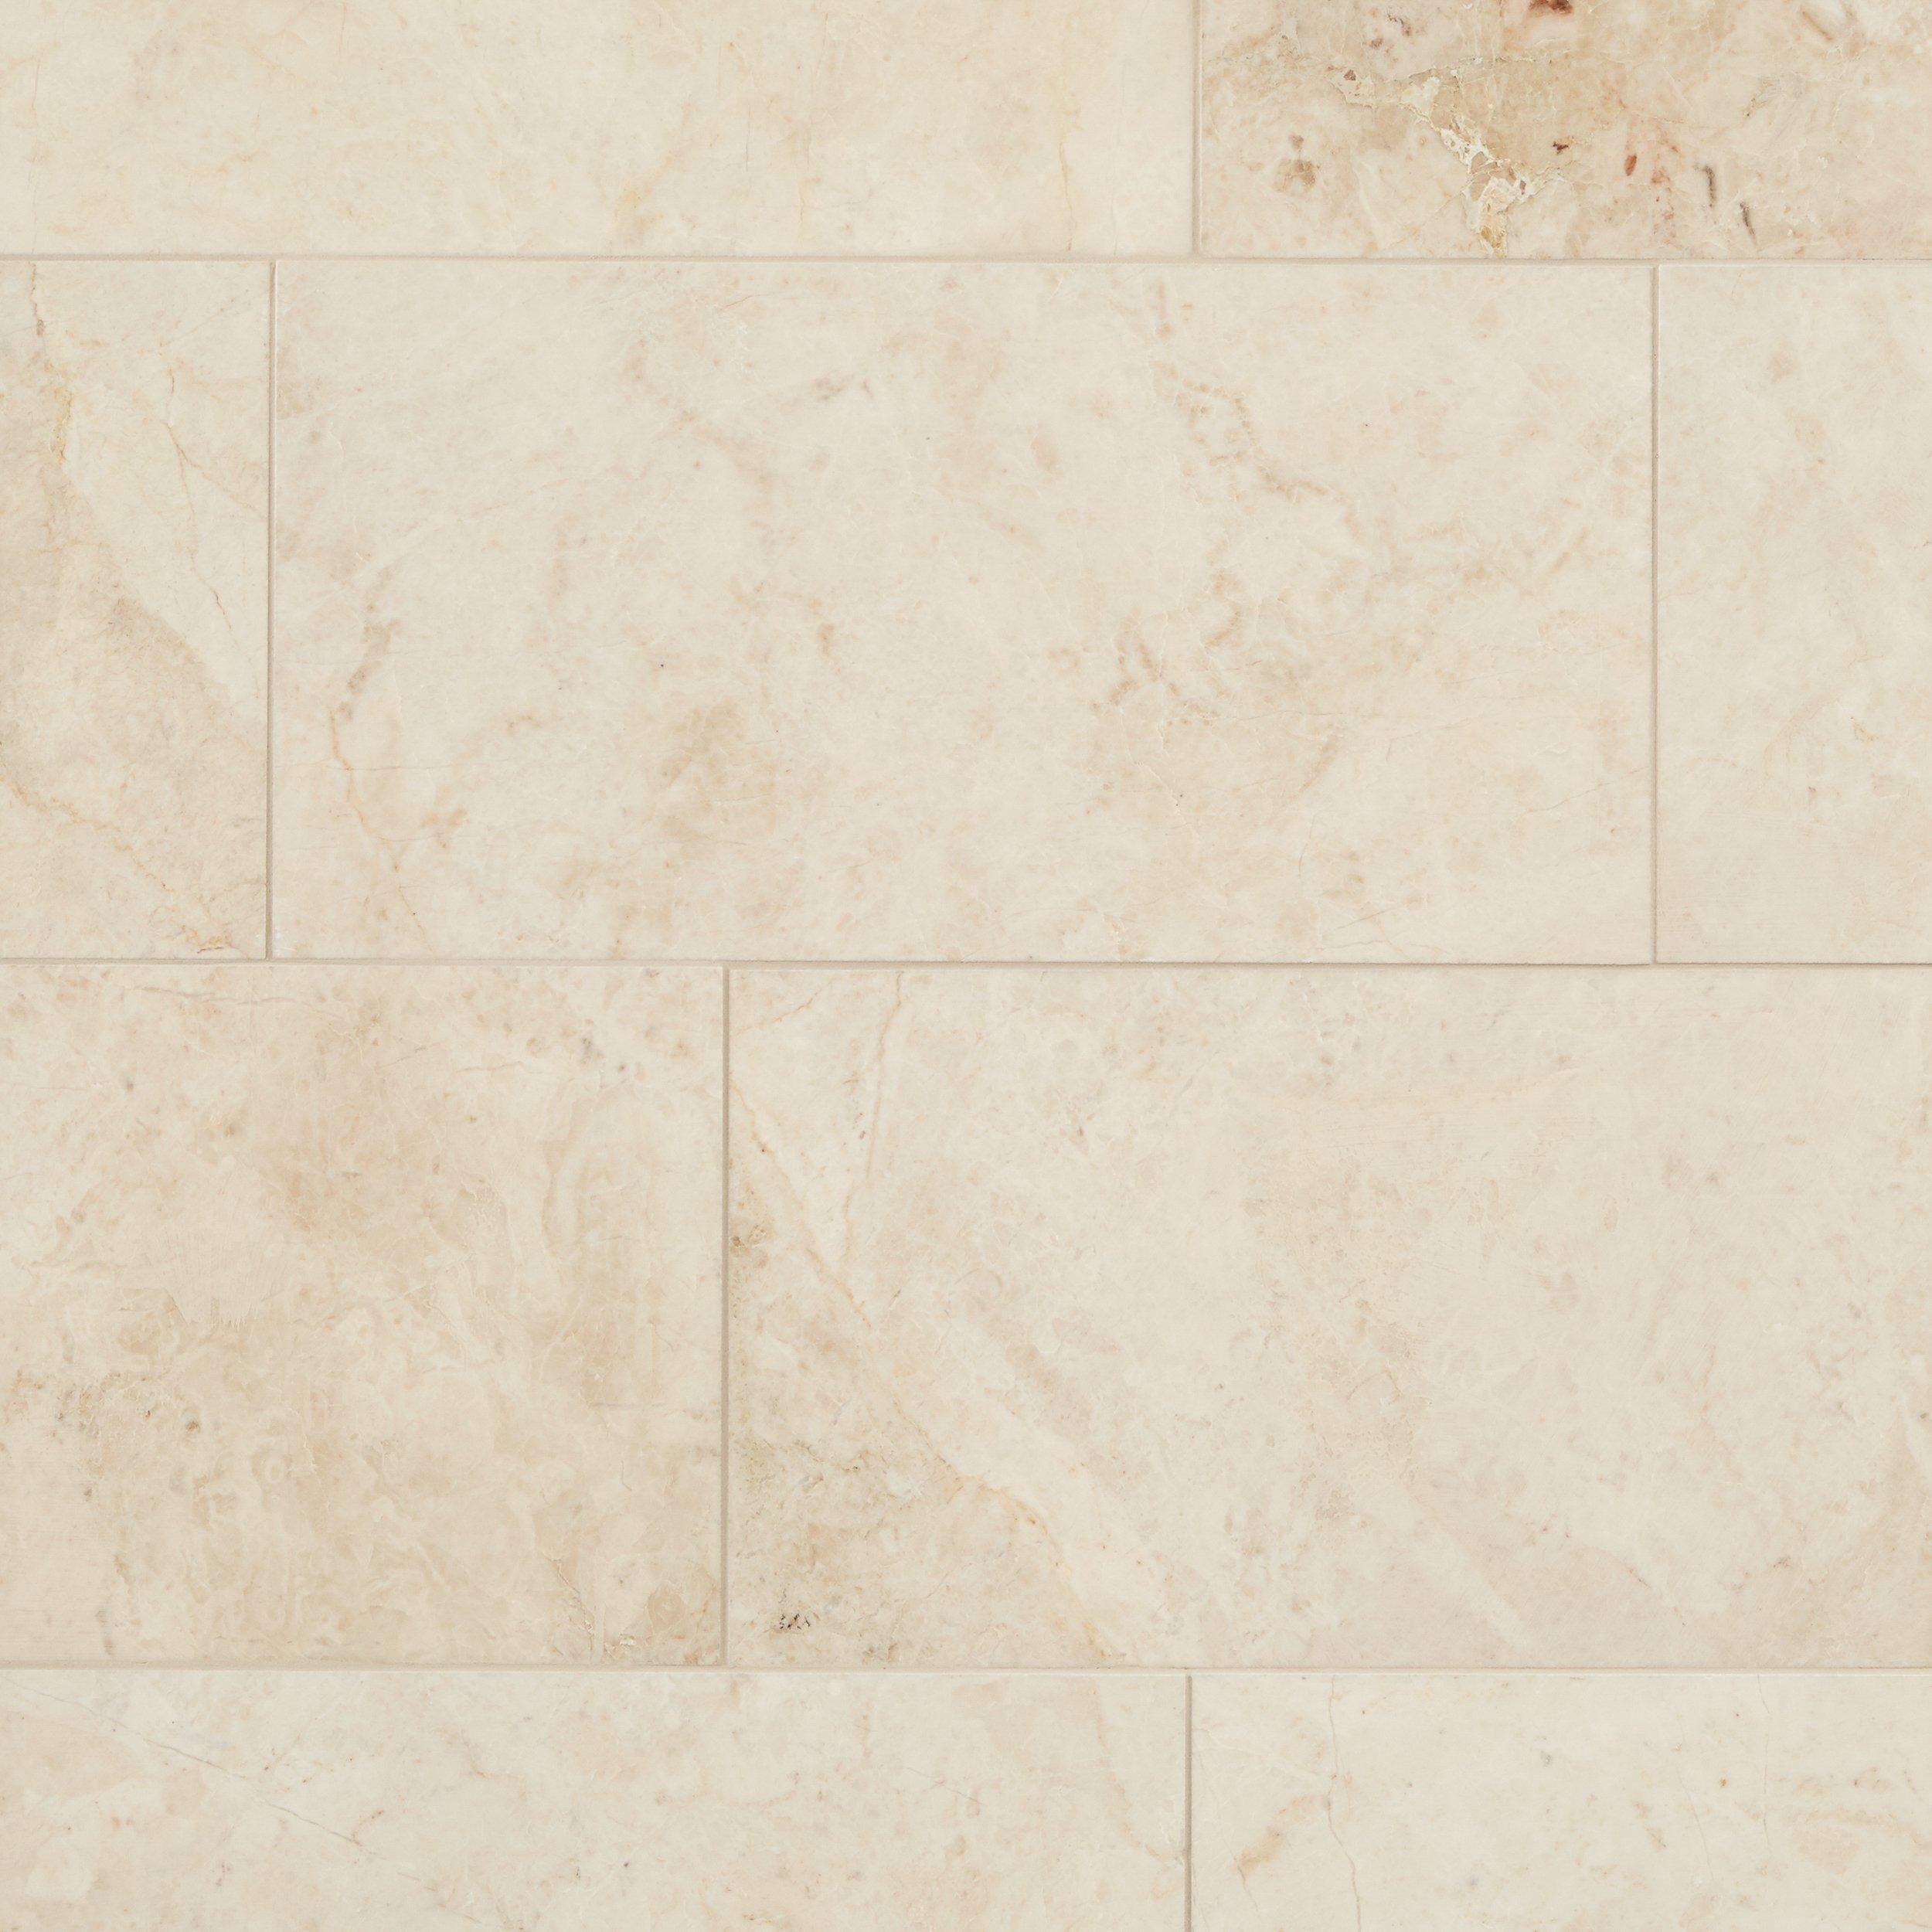 Beige Fantasy Marble Tile Tiles texture, Tiles, Beige marble